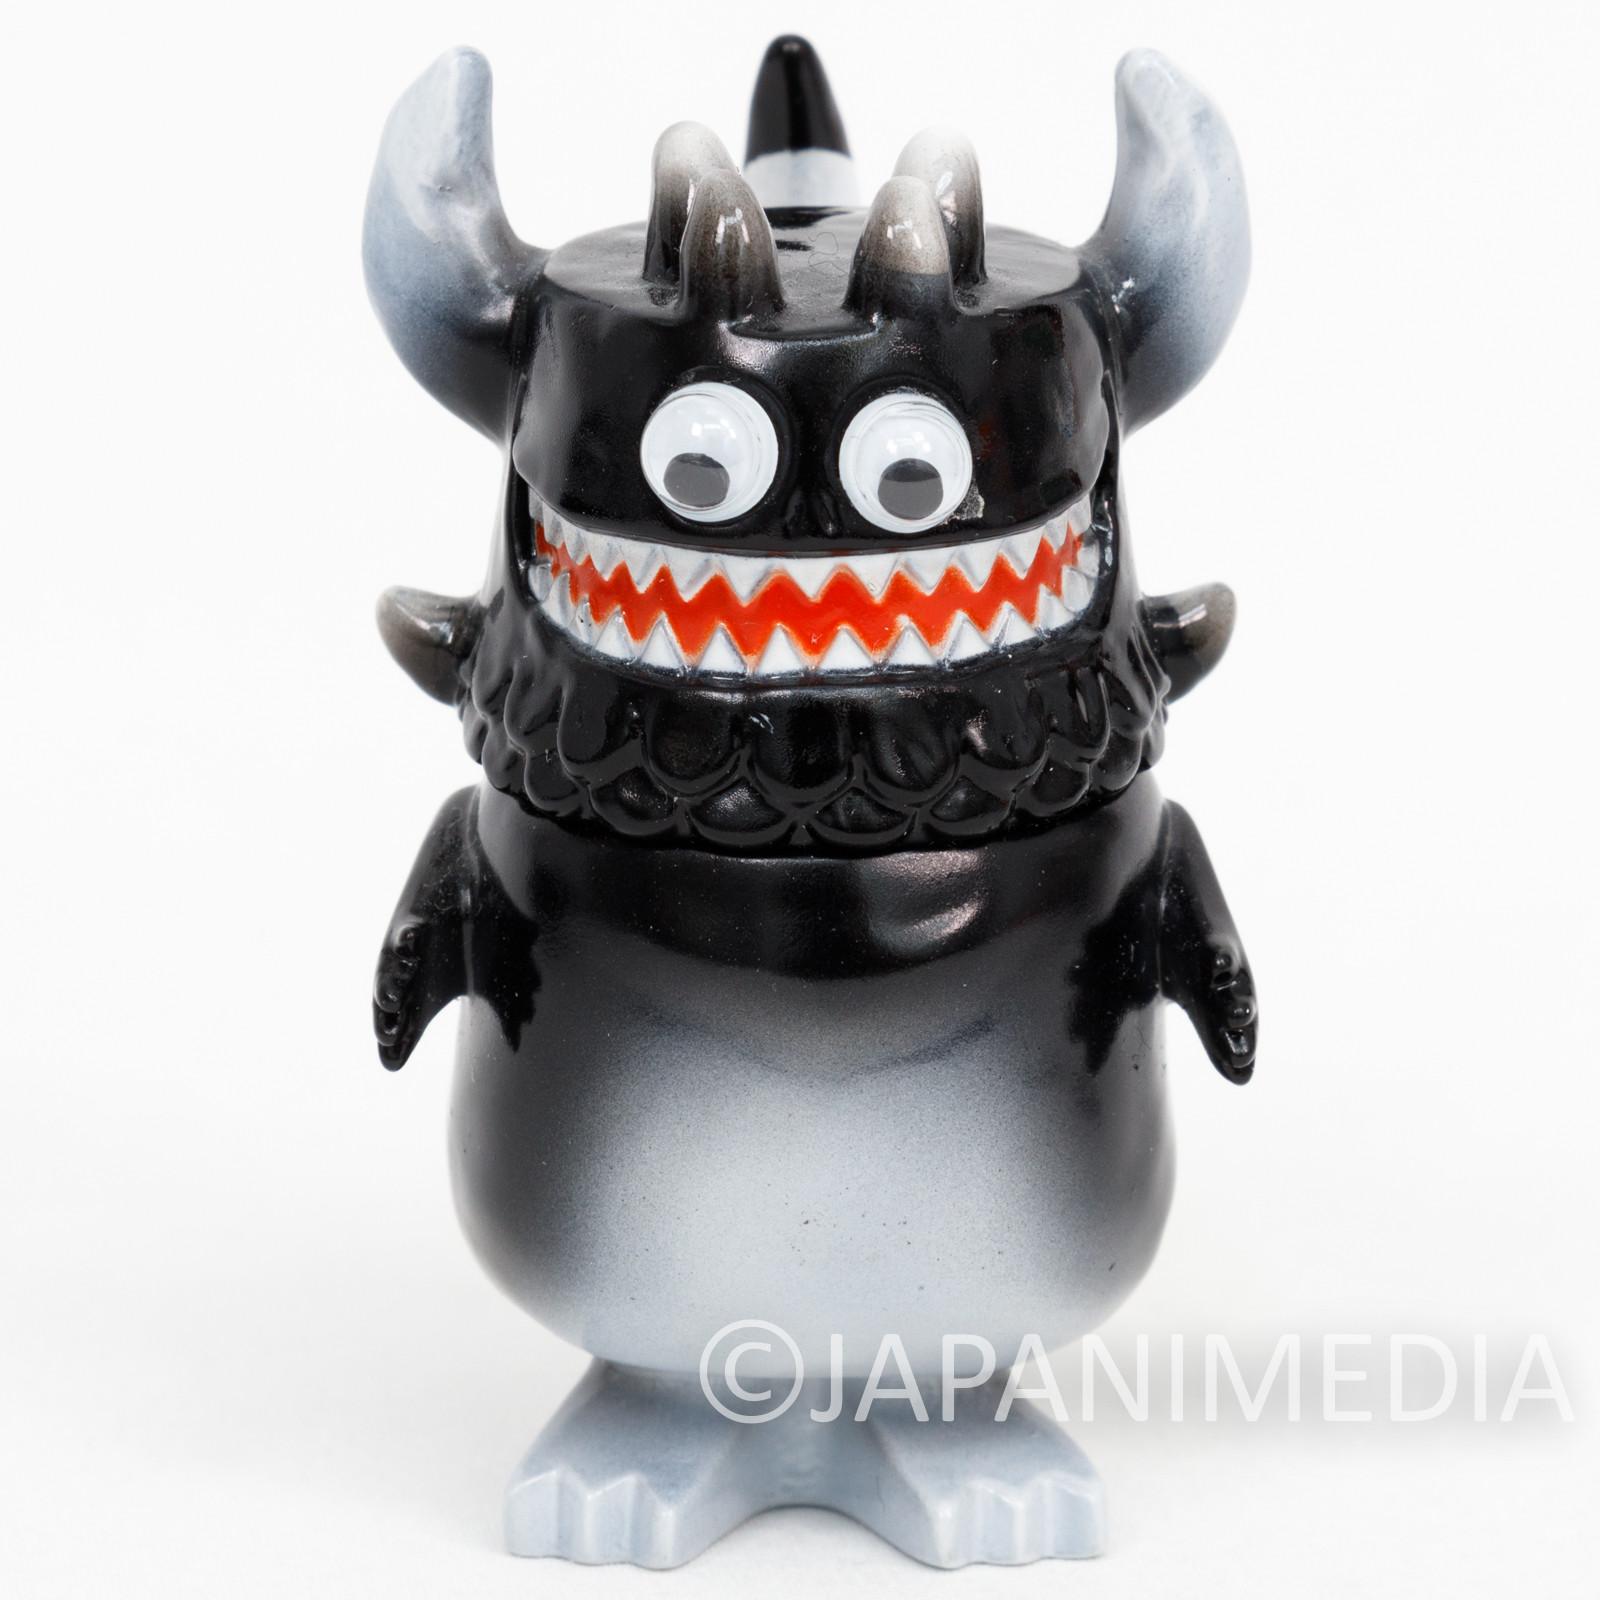 Rangeas Soft Vinyl Figure Medicom Toy VAG Series JAPAN 2